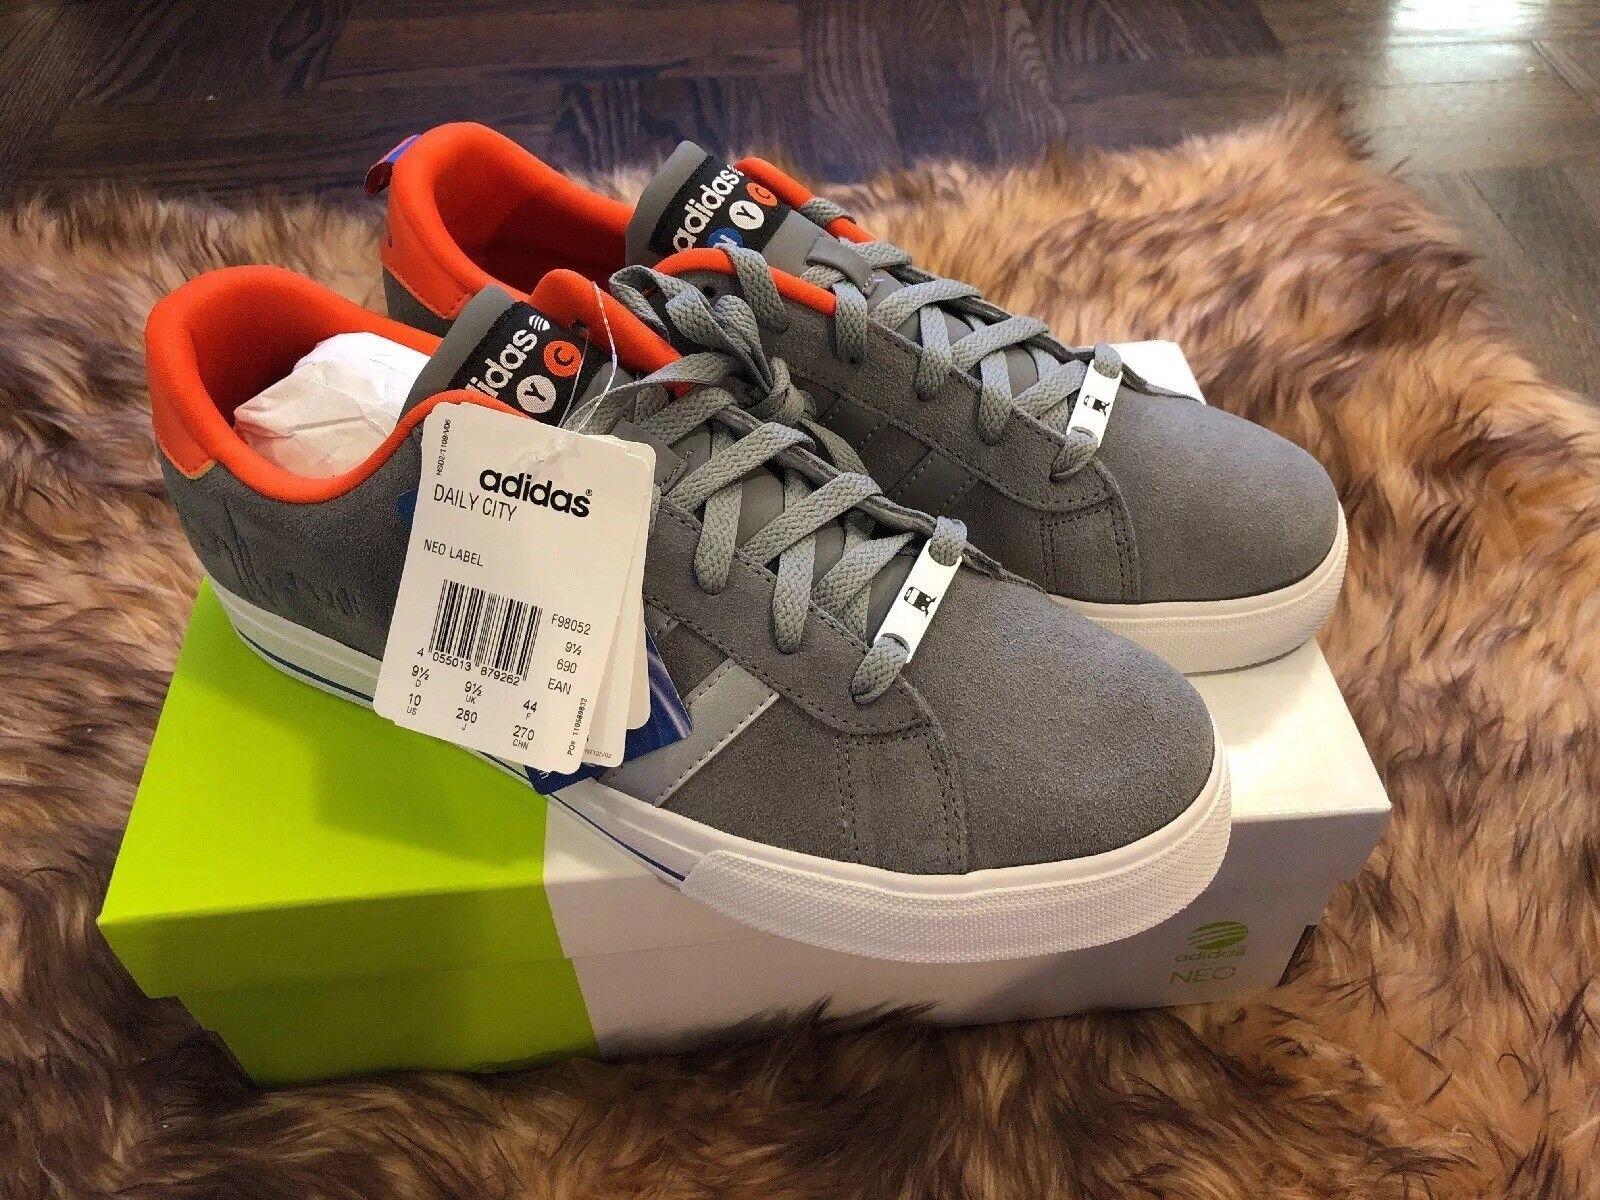 Men's Adidas NEO Daily City NYC Size 10